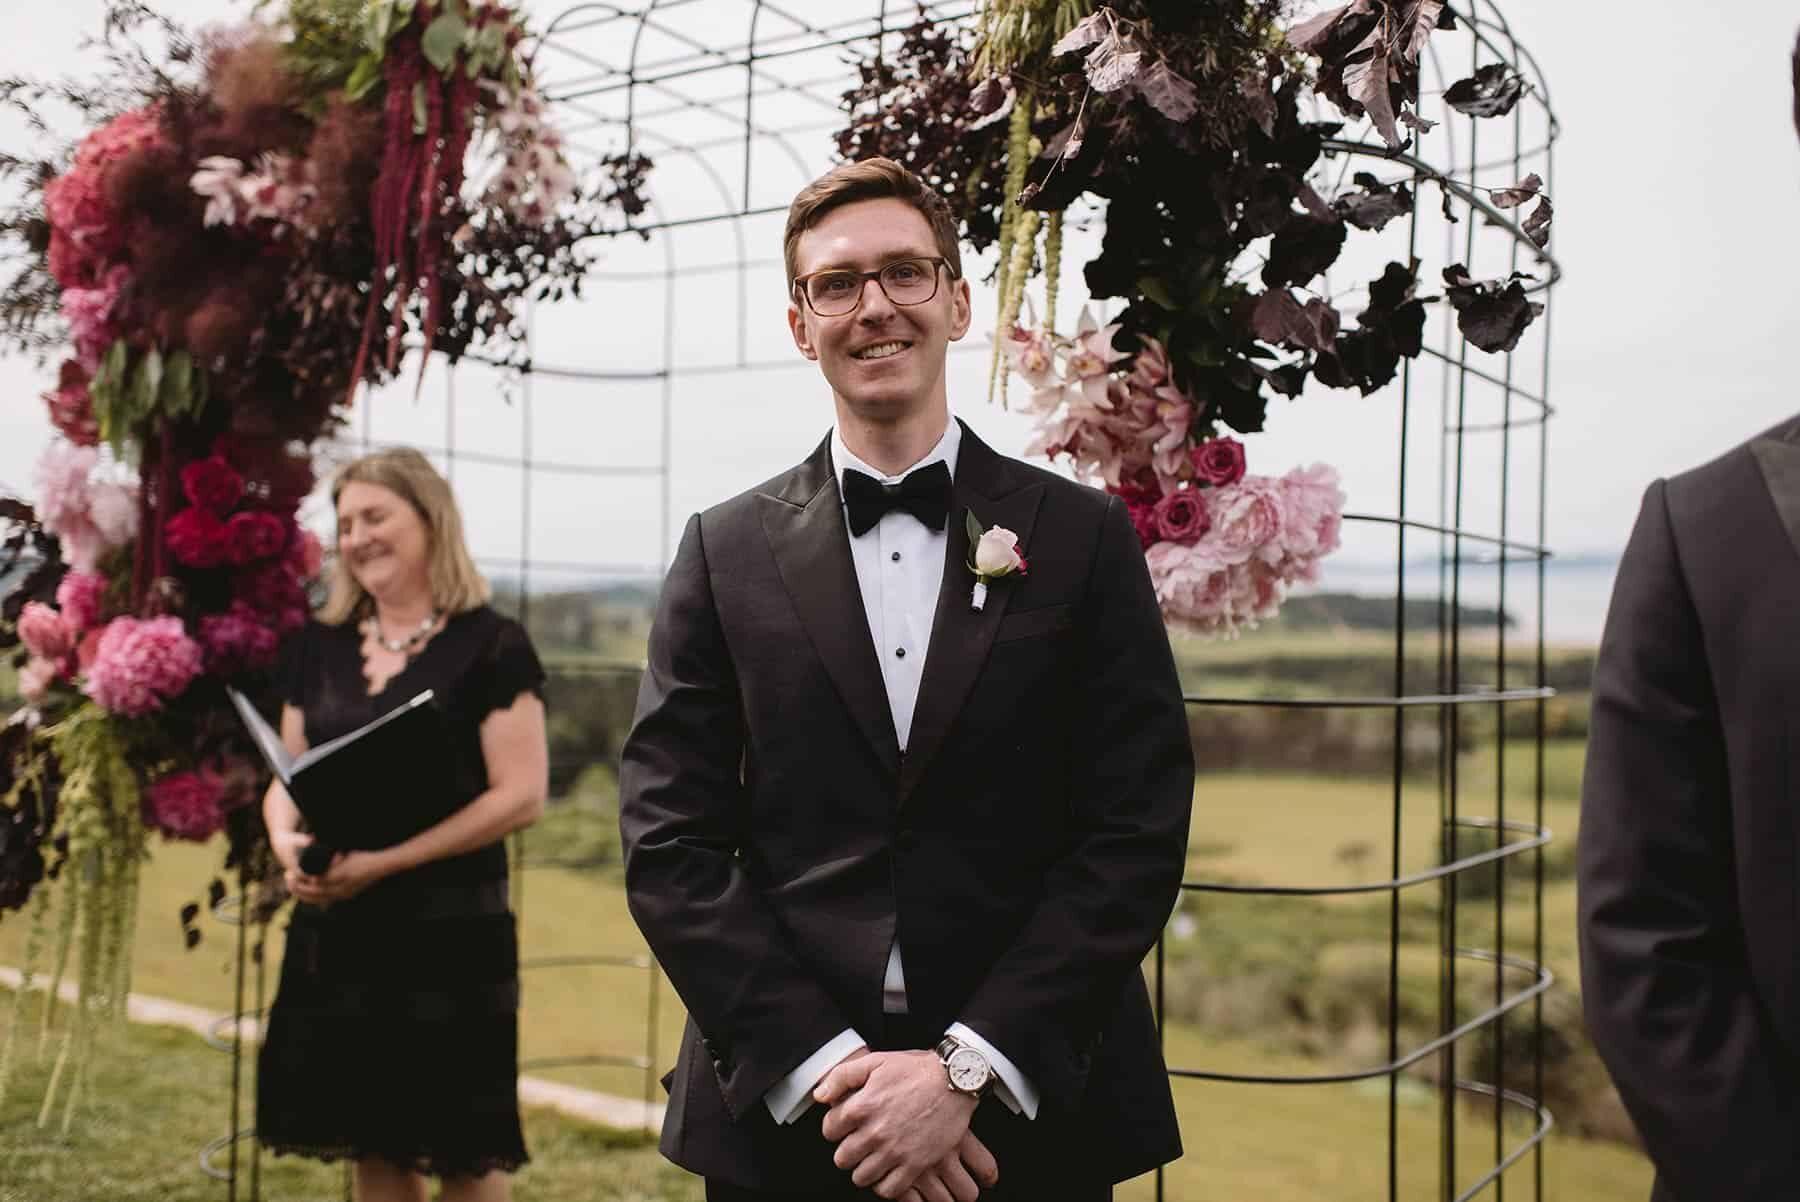 Flower-filled Wedding at Kauri Bay Boomrock / Photography by Nisha Ravji